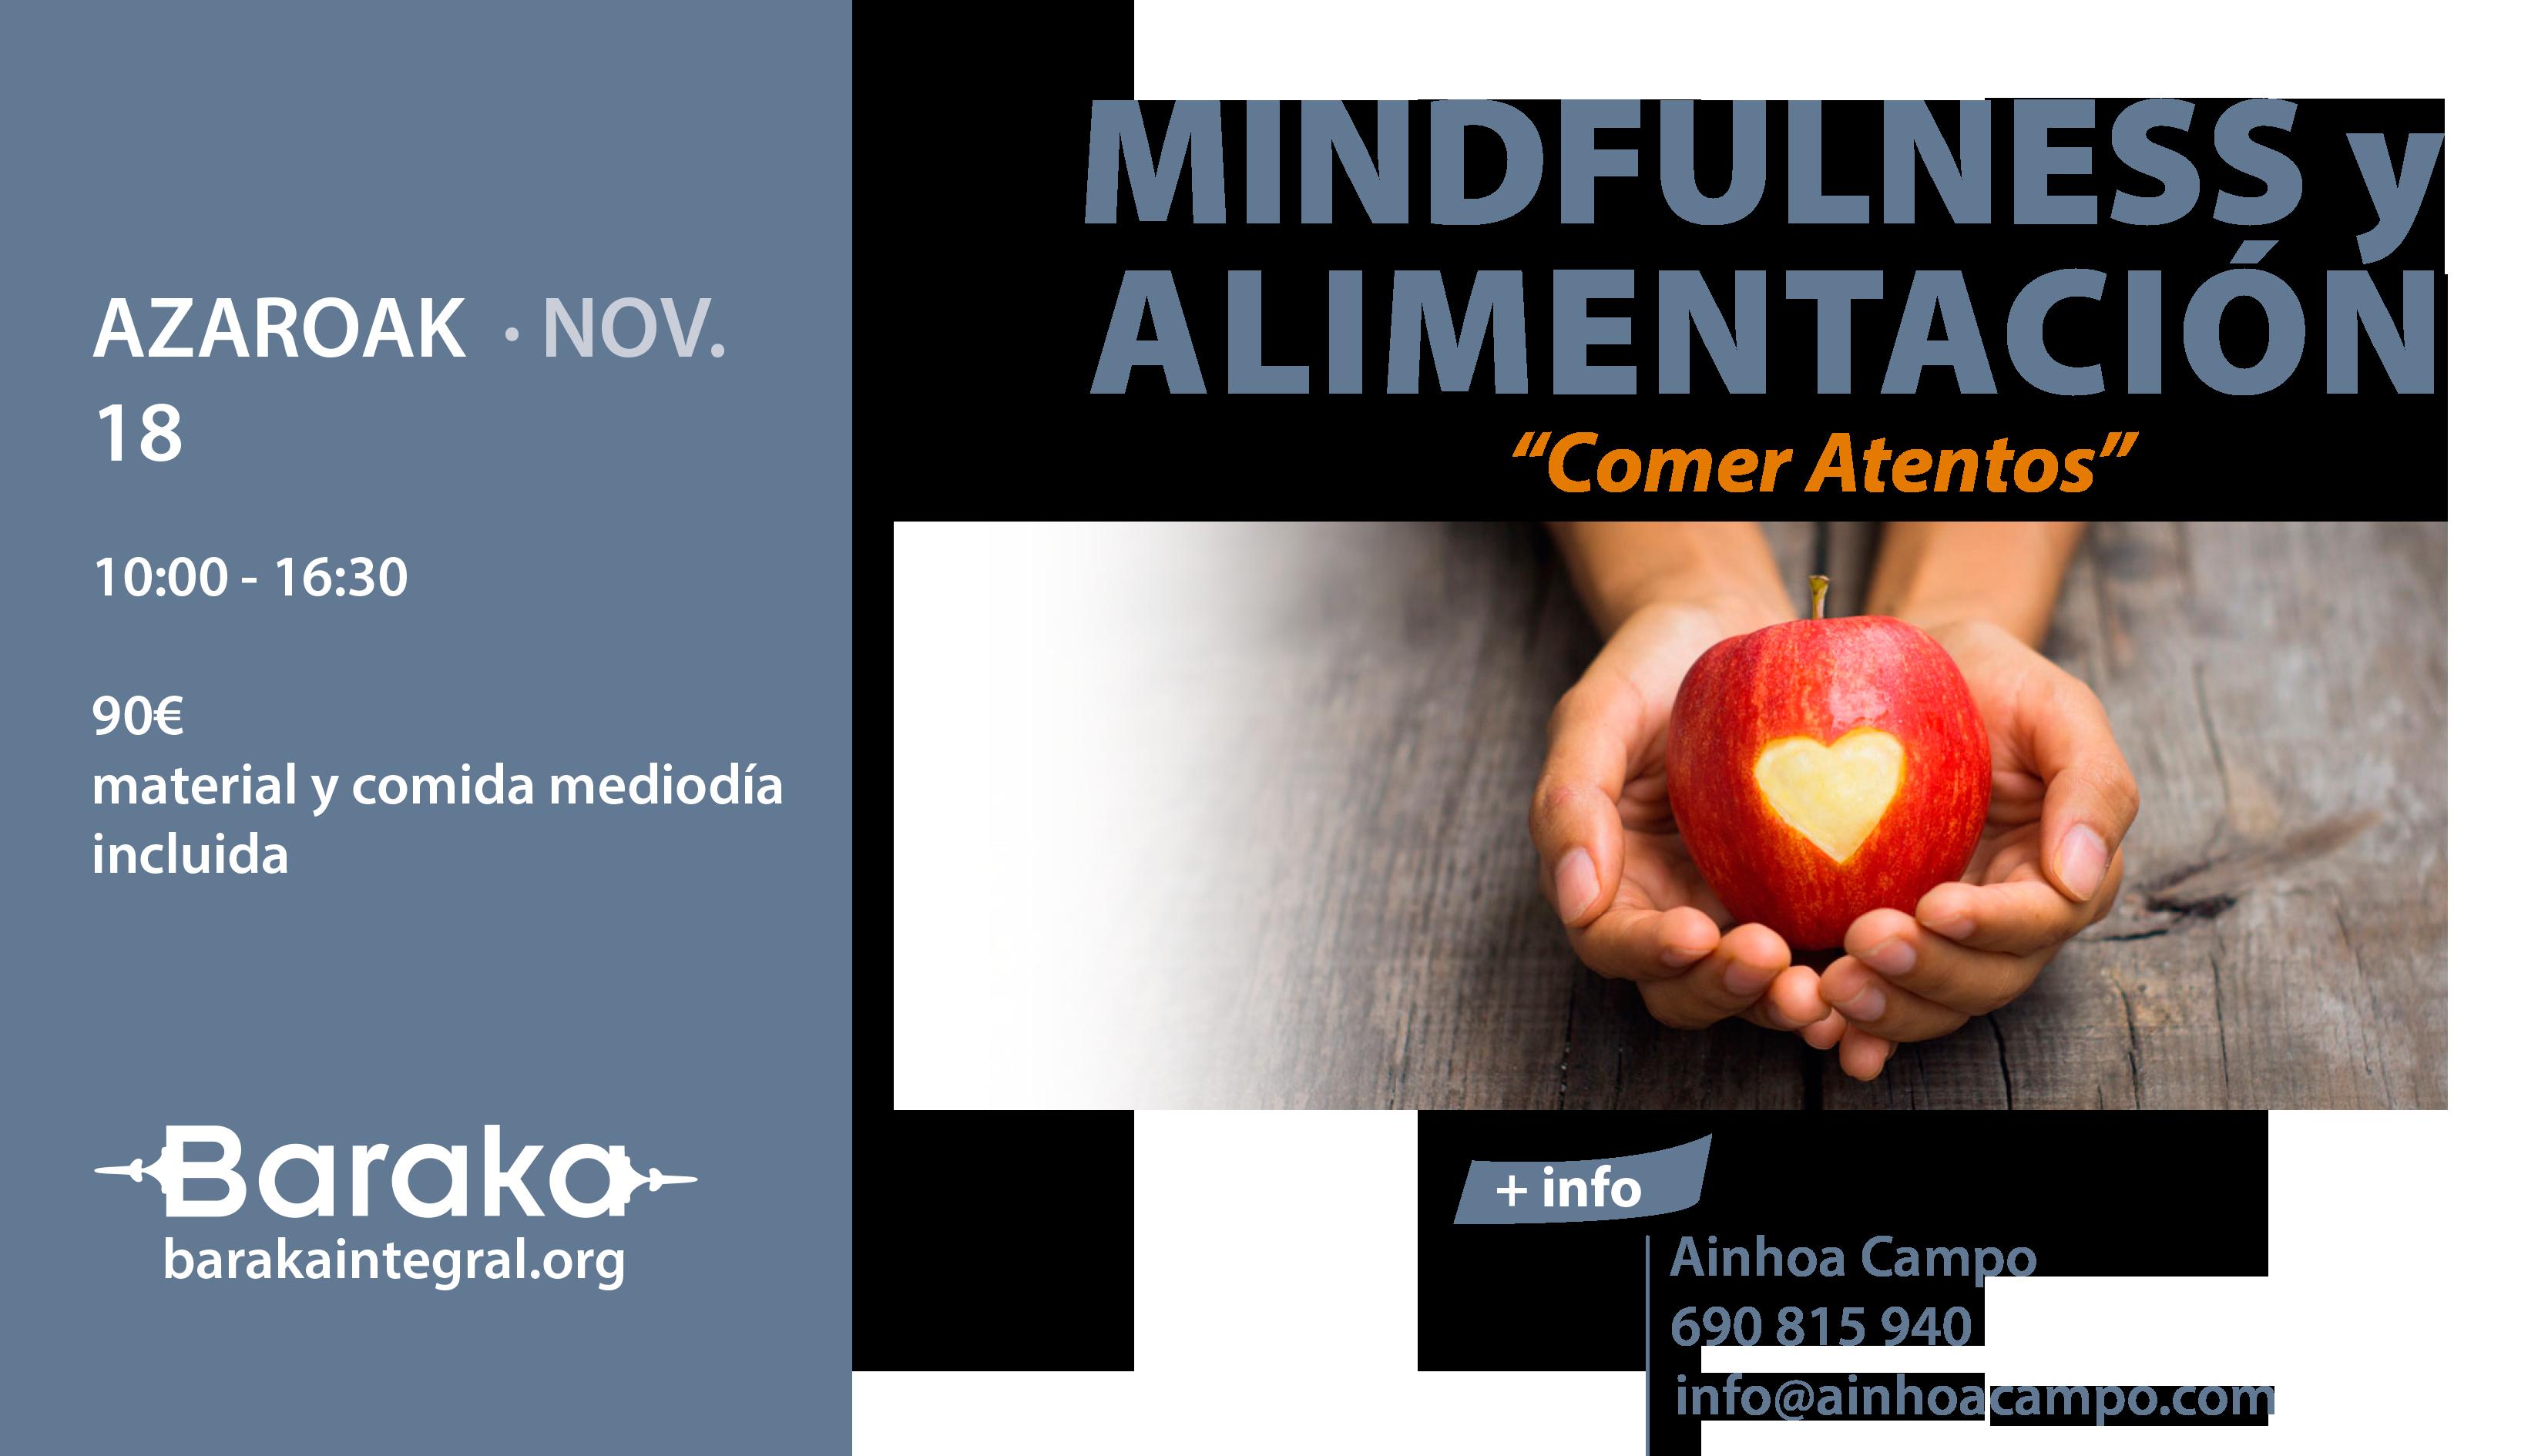 Mindfulness_Alimentacion